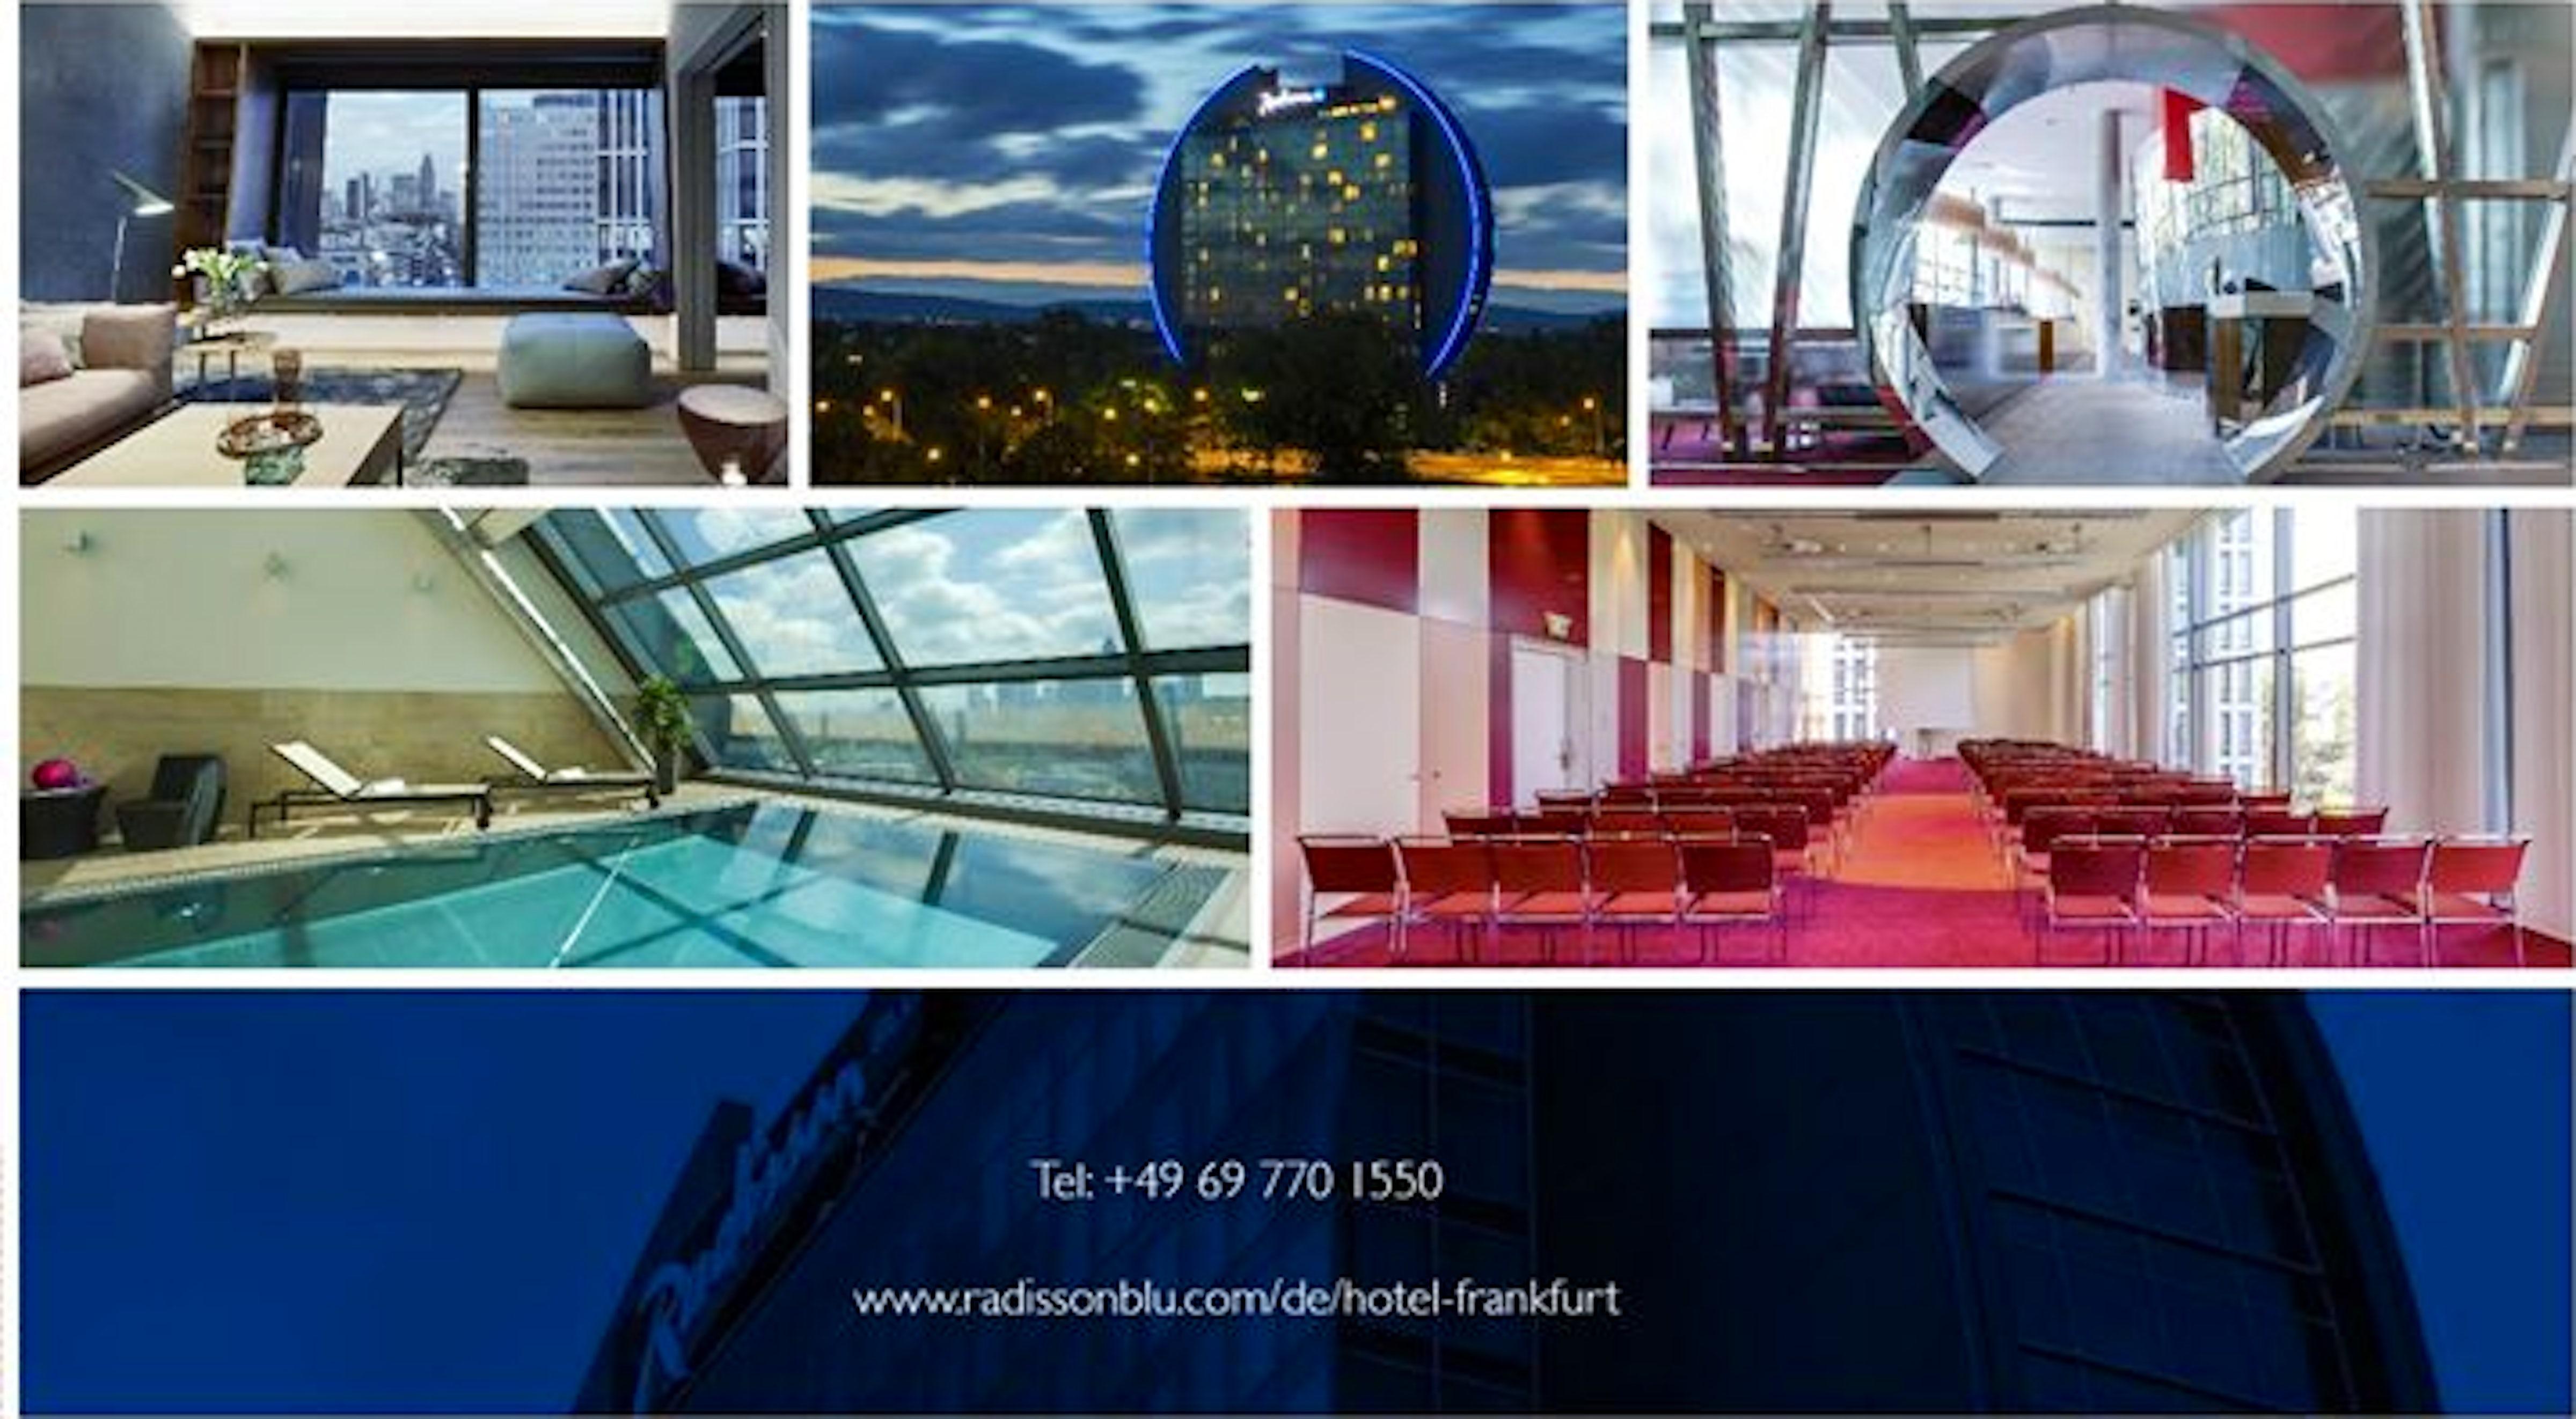 radisson blu hotel frankfurt itinari. Black Bedroom Furniture Sets. Home Design Ideas